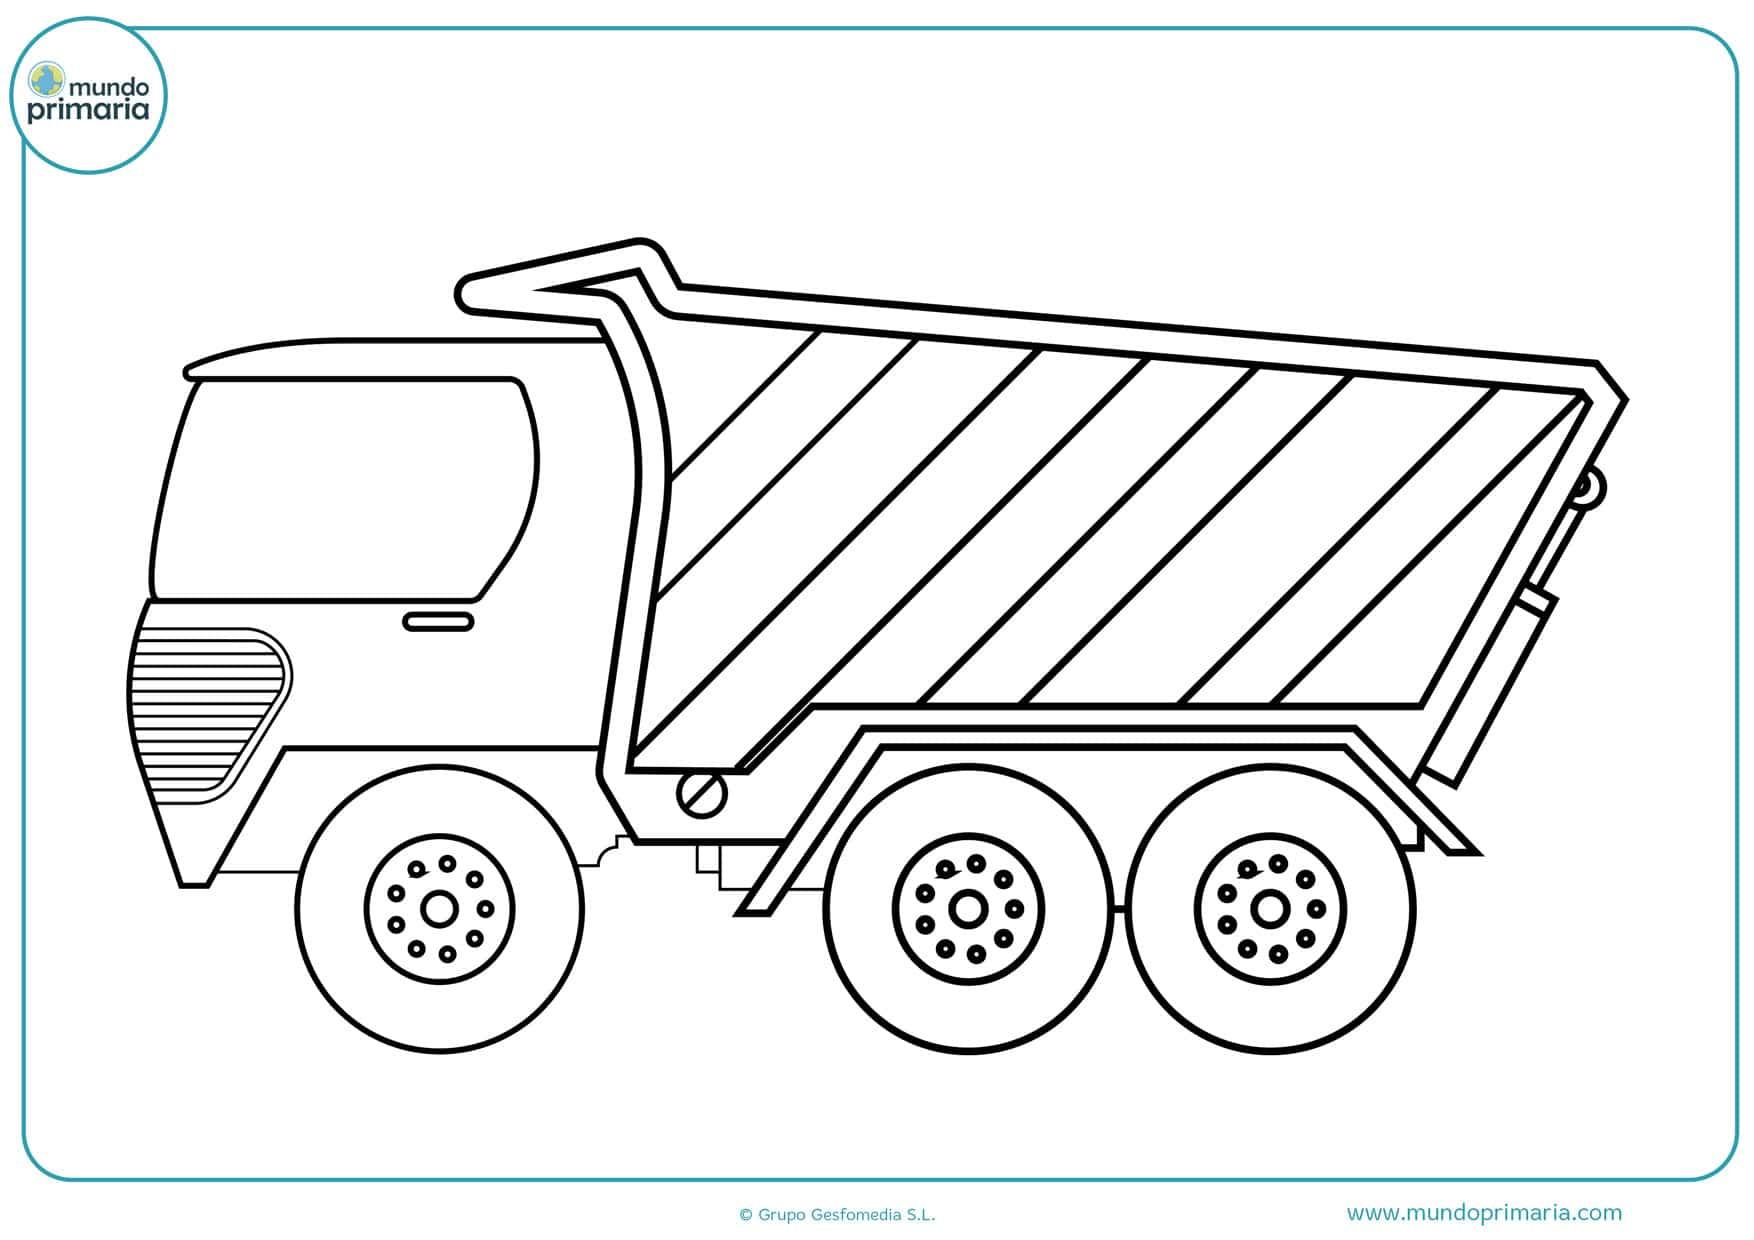 dibujos para colorear e imprimir de camiones